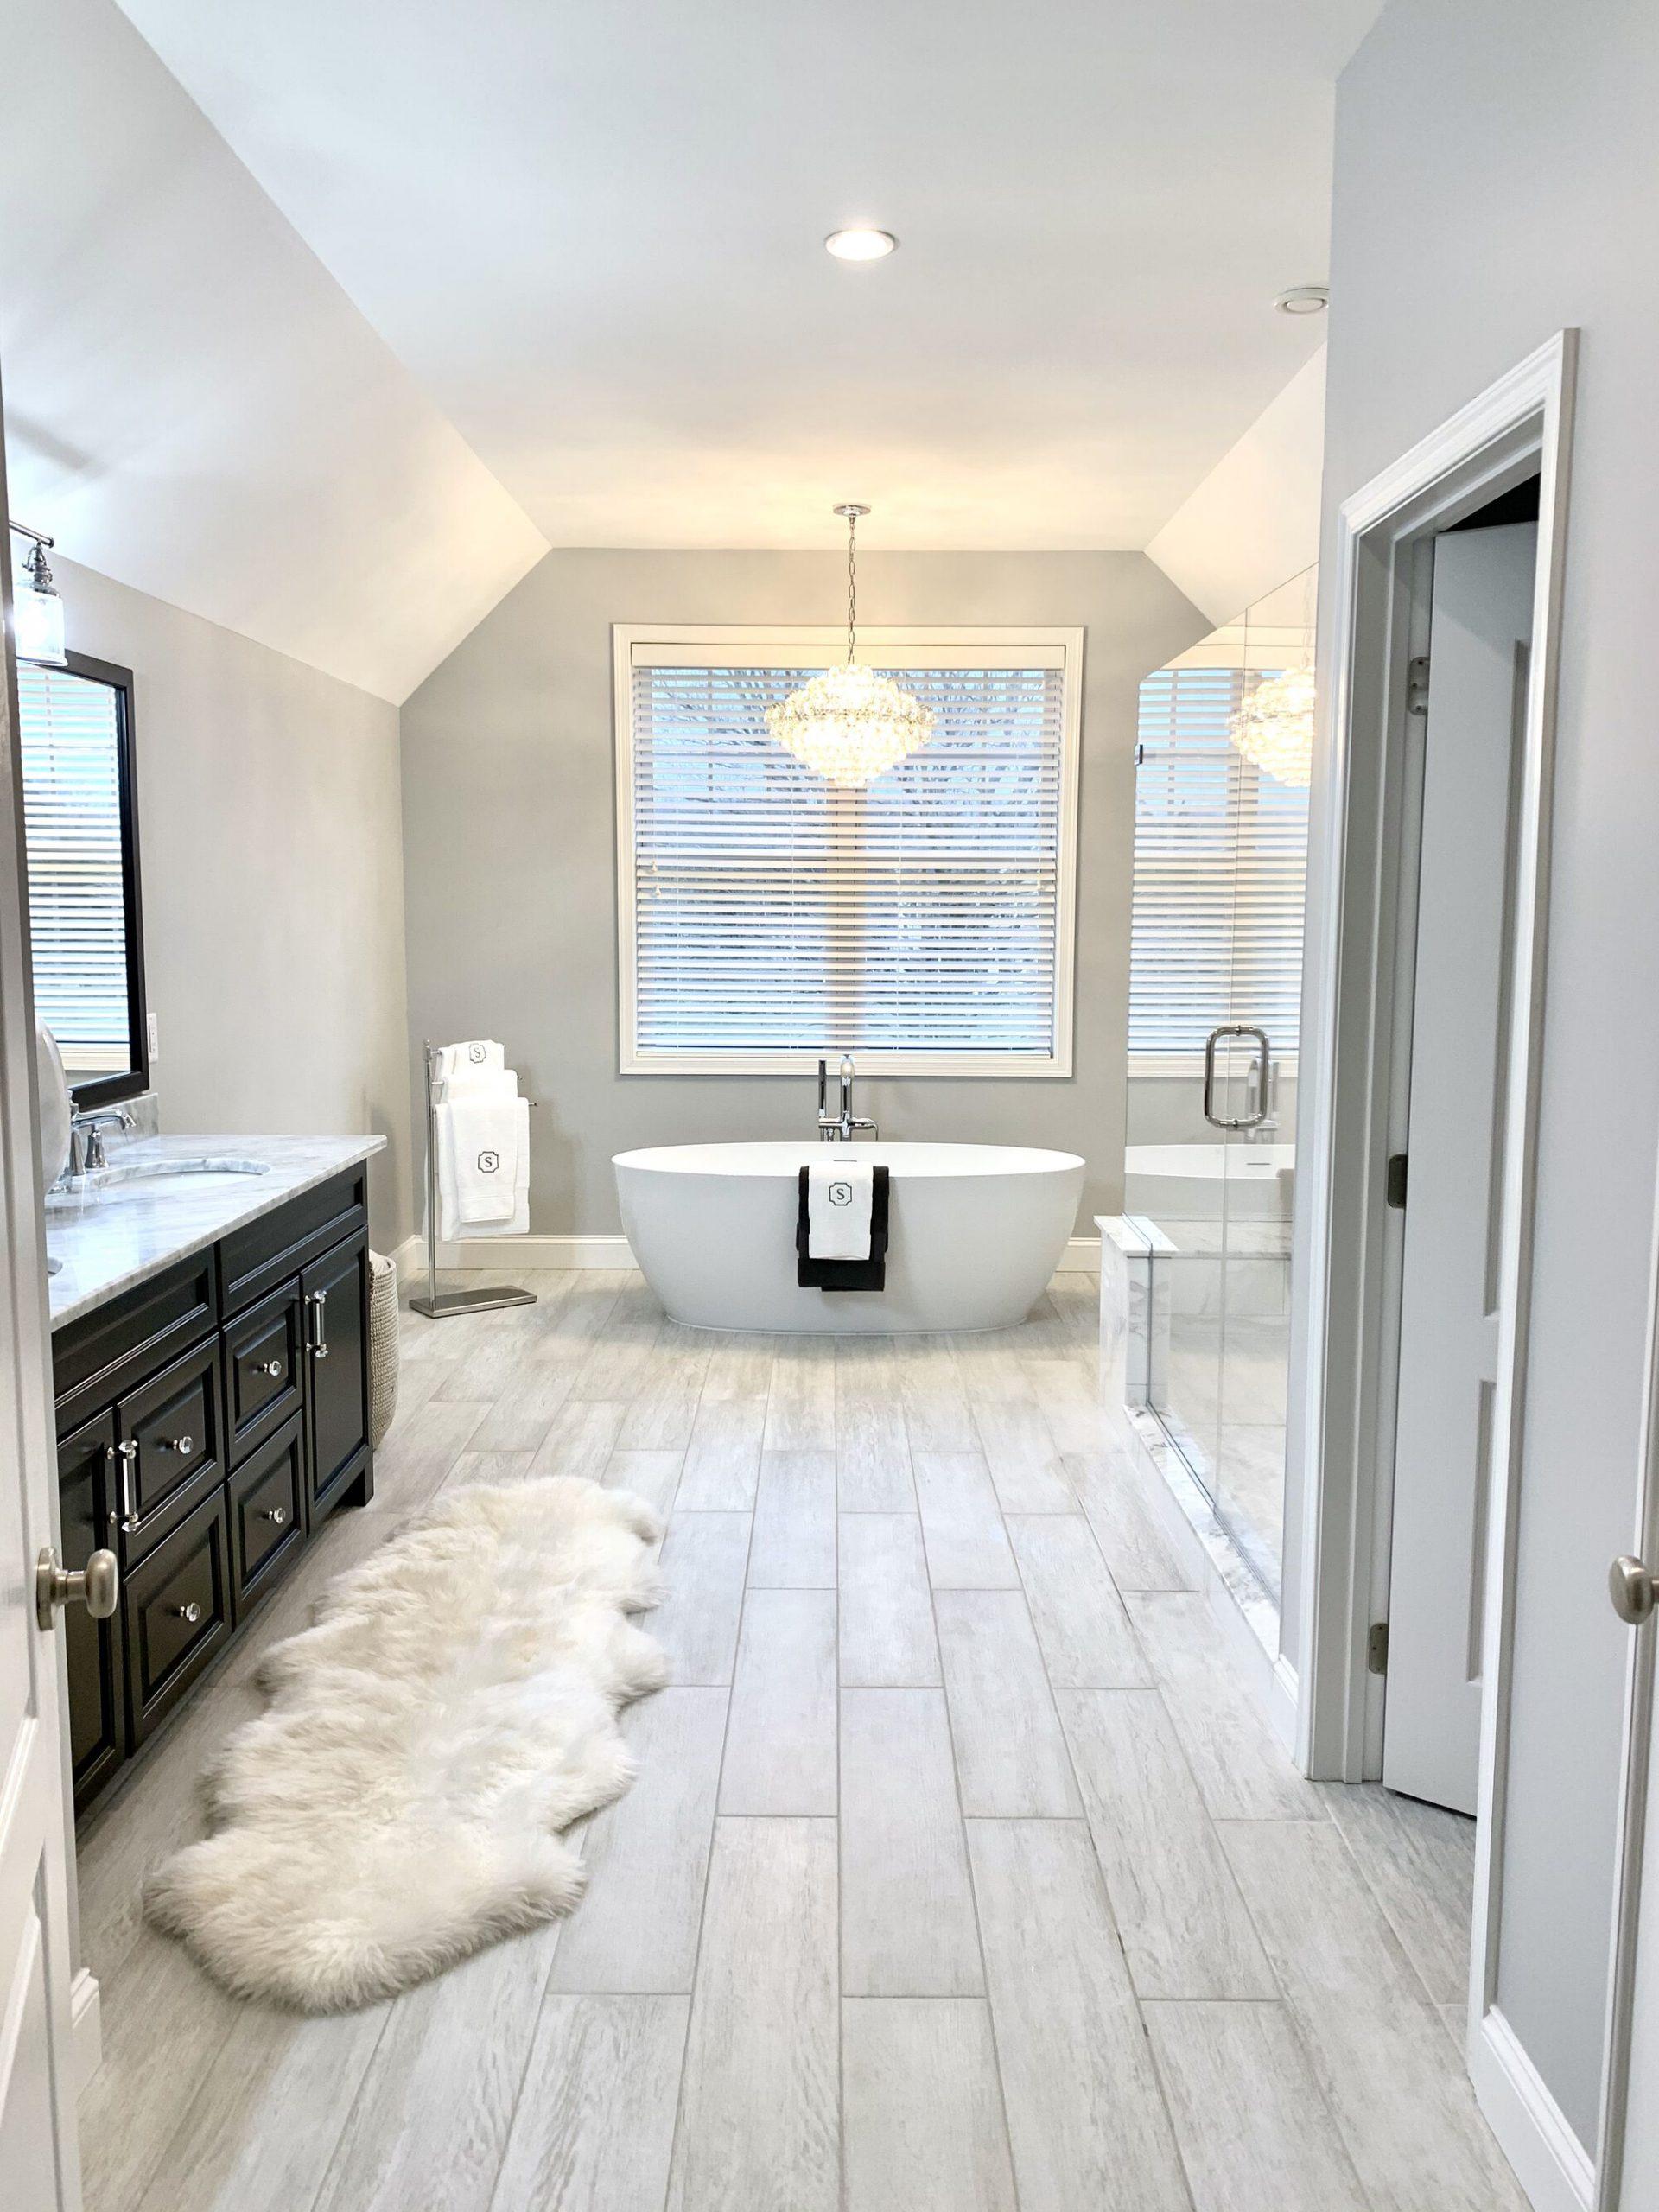 Master Bath Renovation with Porcelain Flooring and Kohler Fixtures, Freestanding Tub, Custom Shower In Sparta, Sussex County NJ